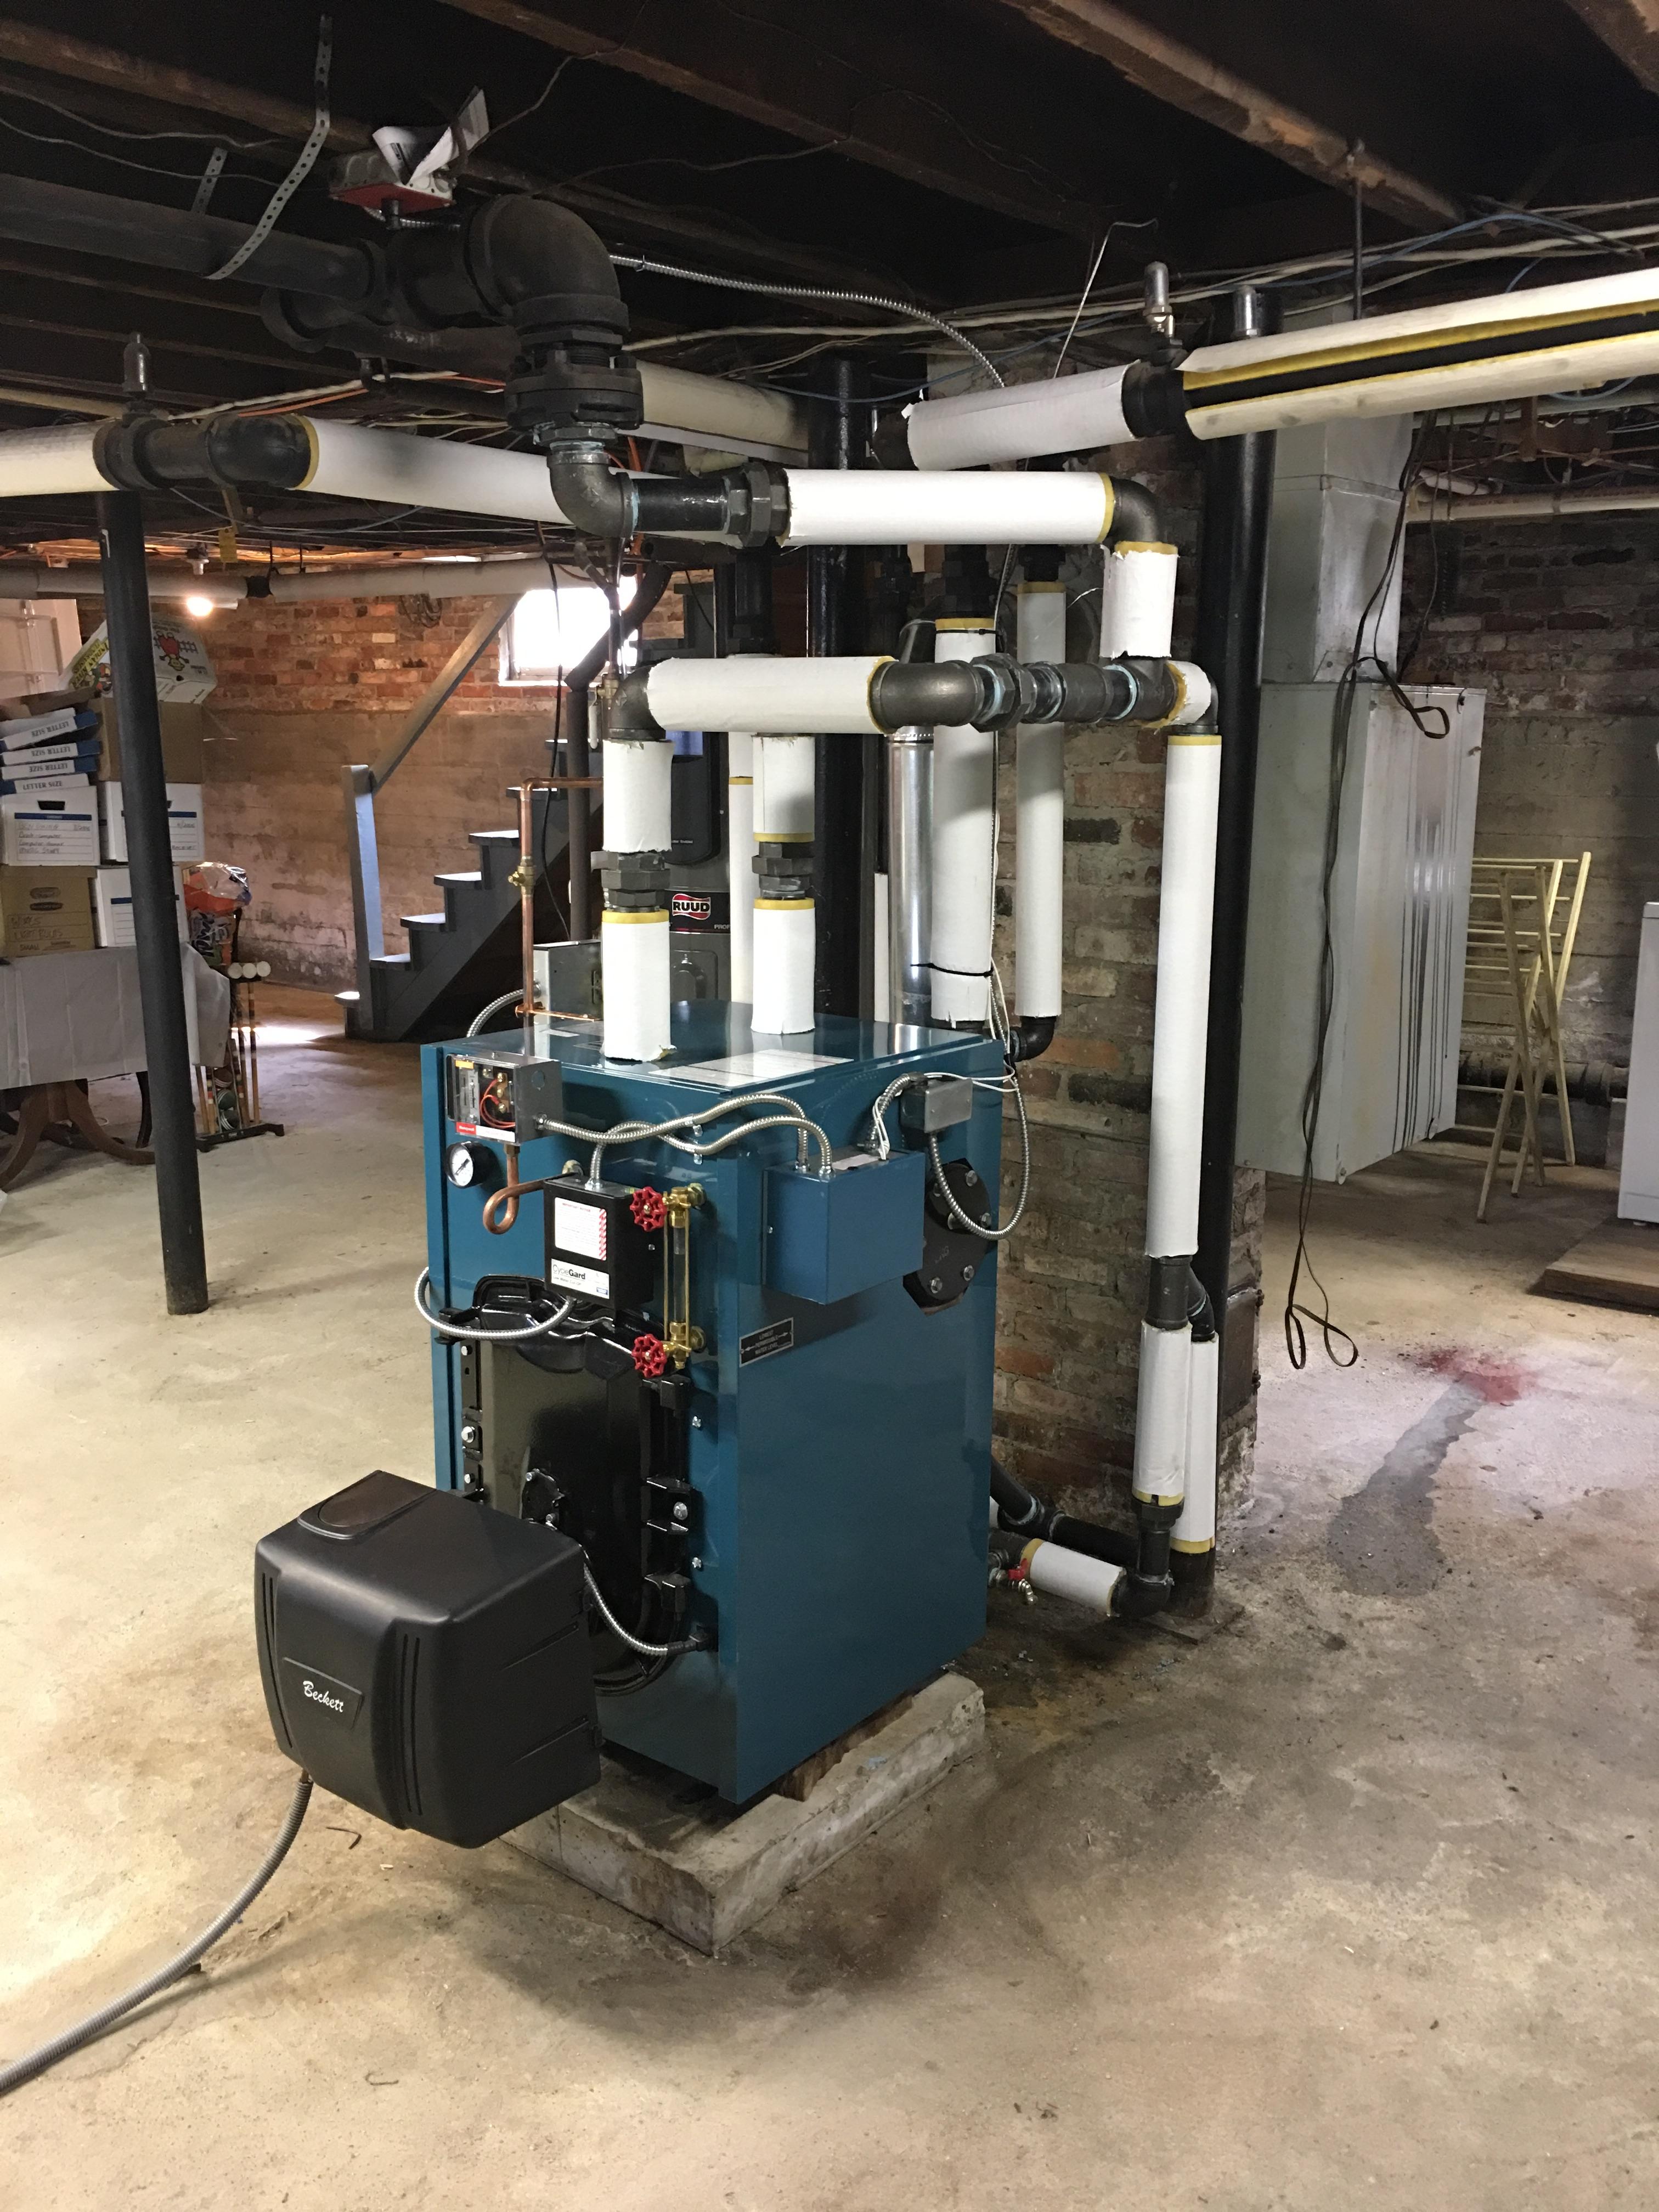 Maine Steam Boiler Installation Professional Recomendation